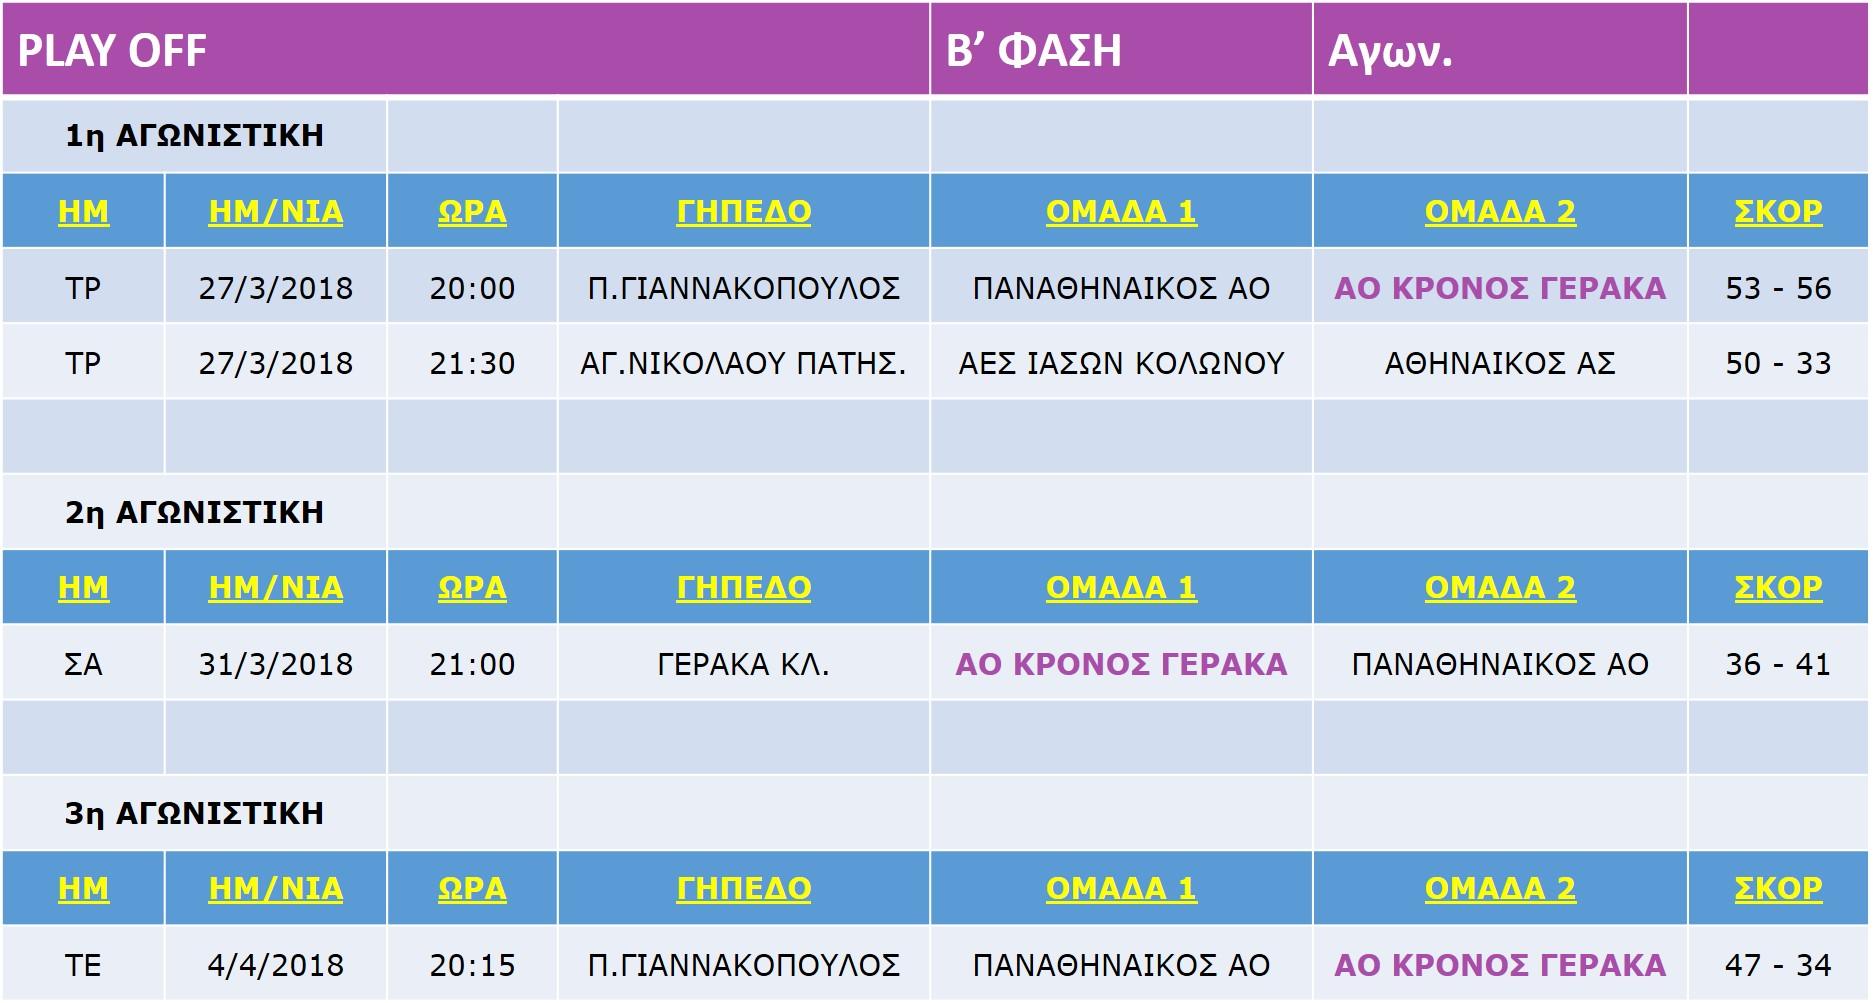 Korasides_Match_A_Play-Off_B